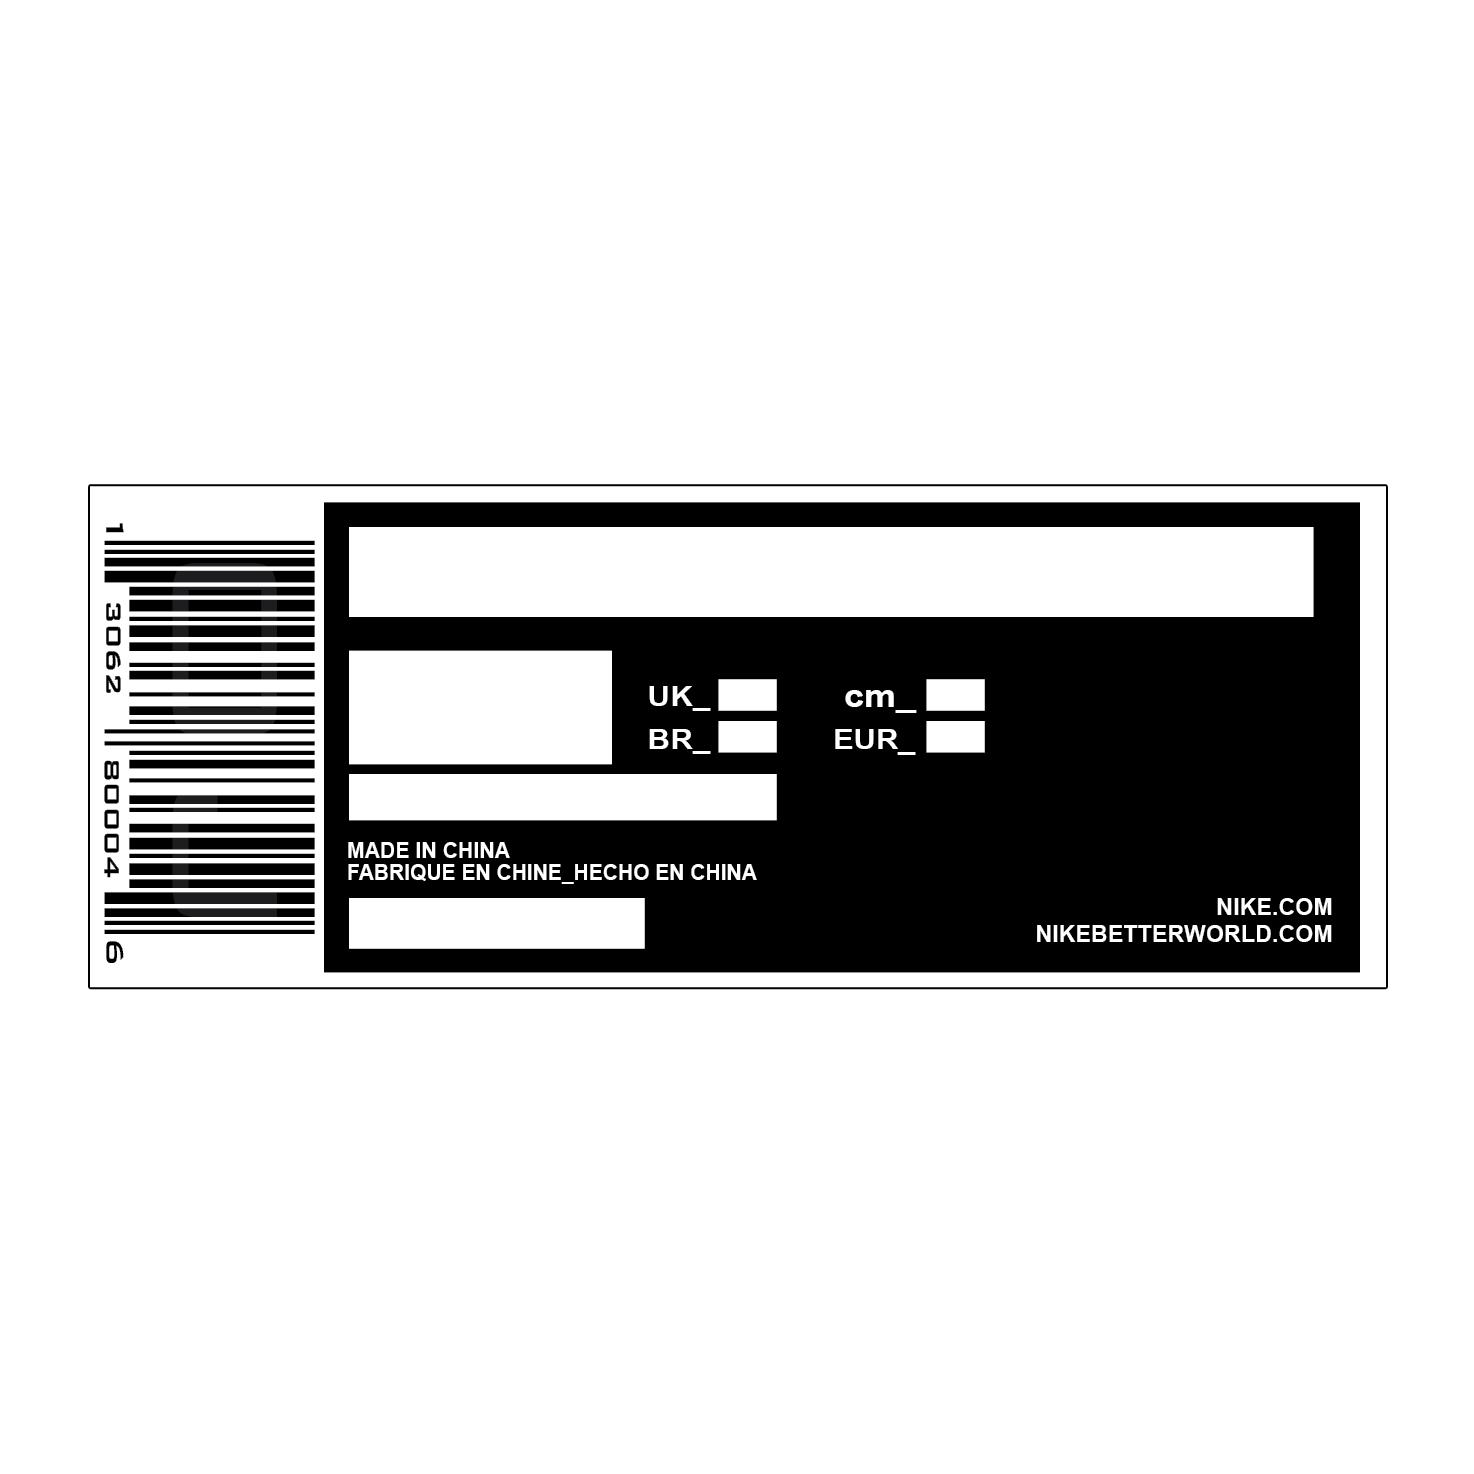 Universal Nike Shoe Box Label